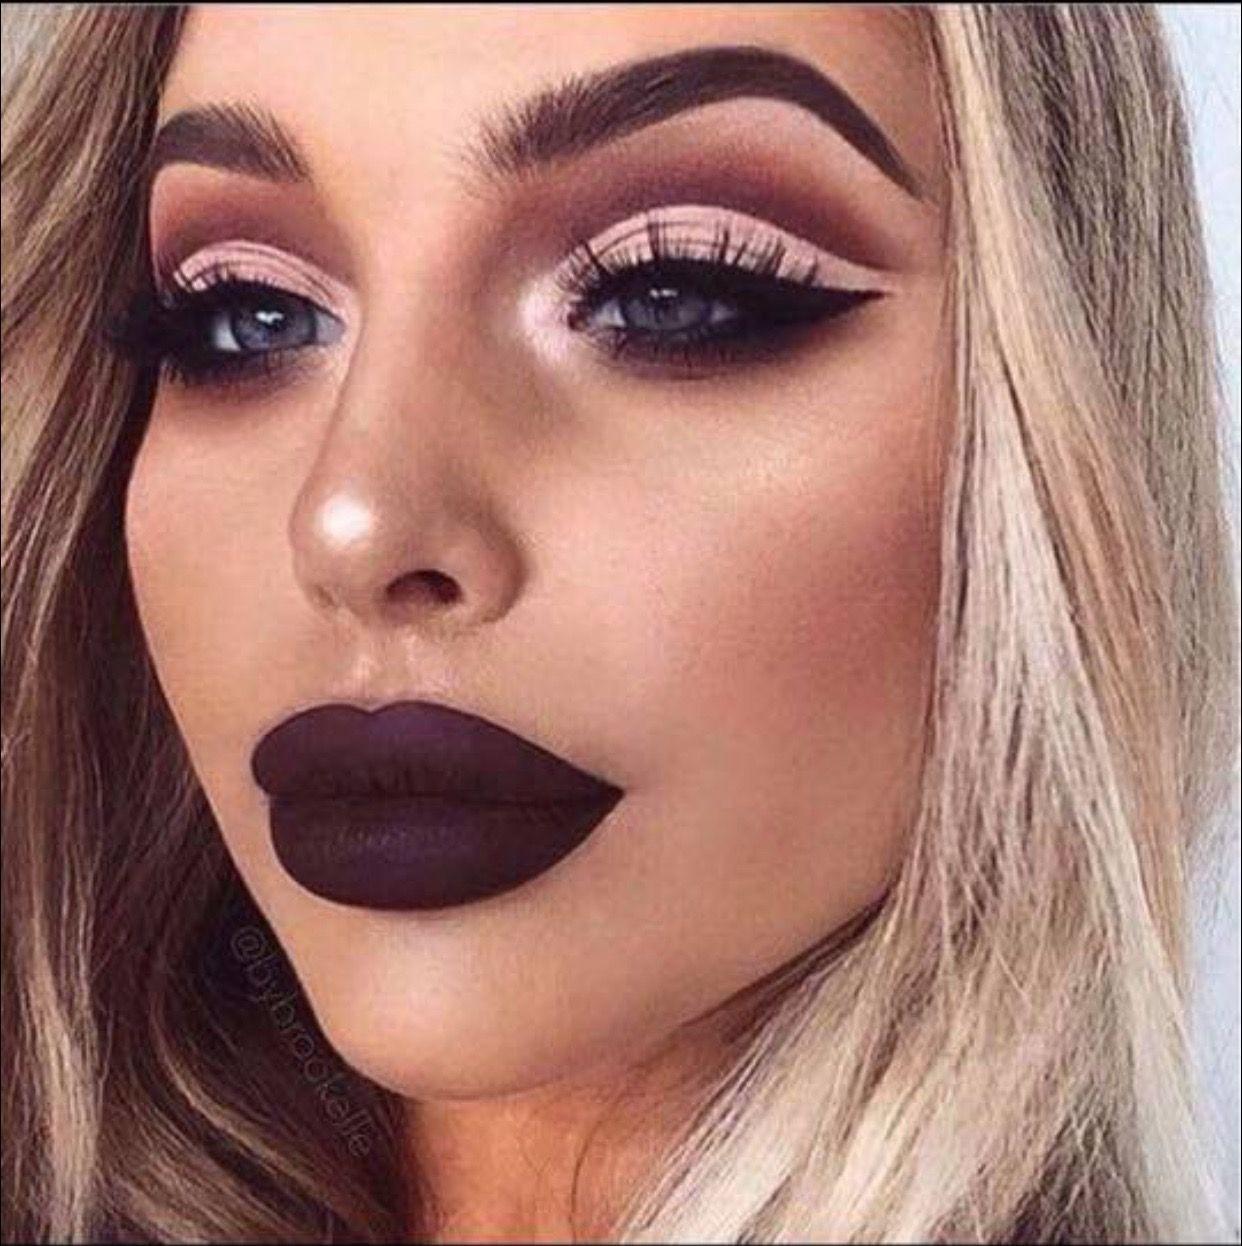 Bold Makeup Look and Lips Dark Plum Burgundy Liquid